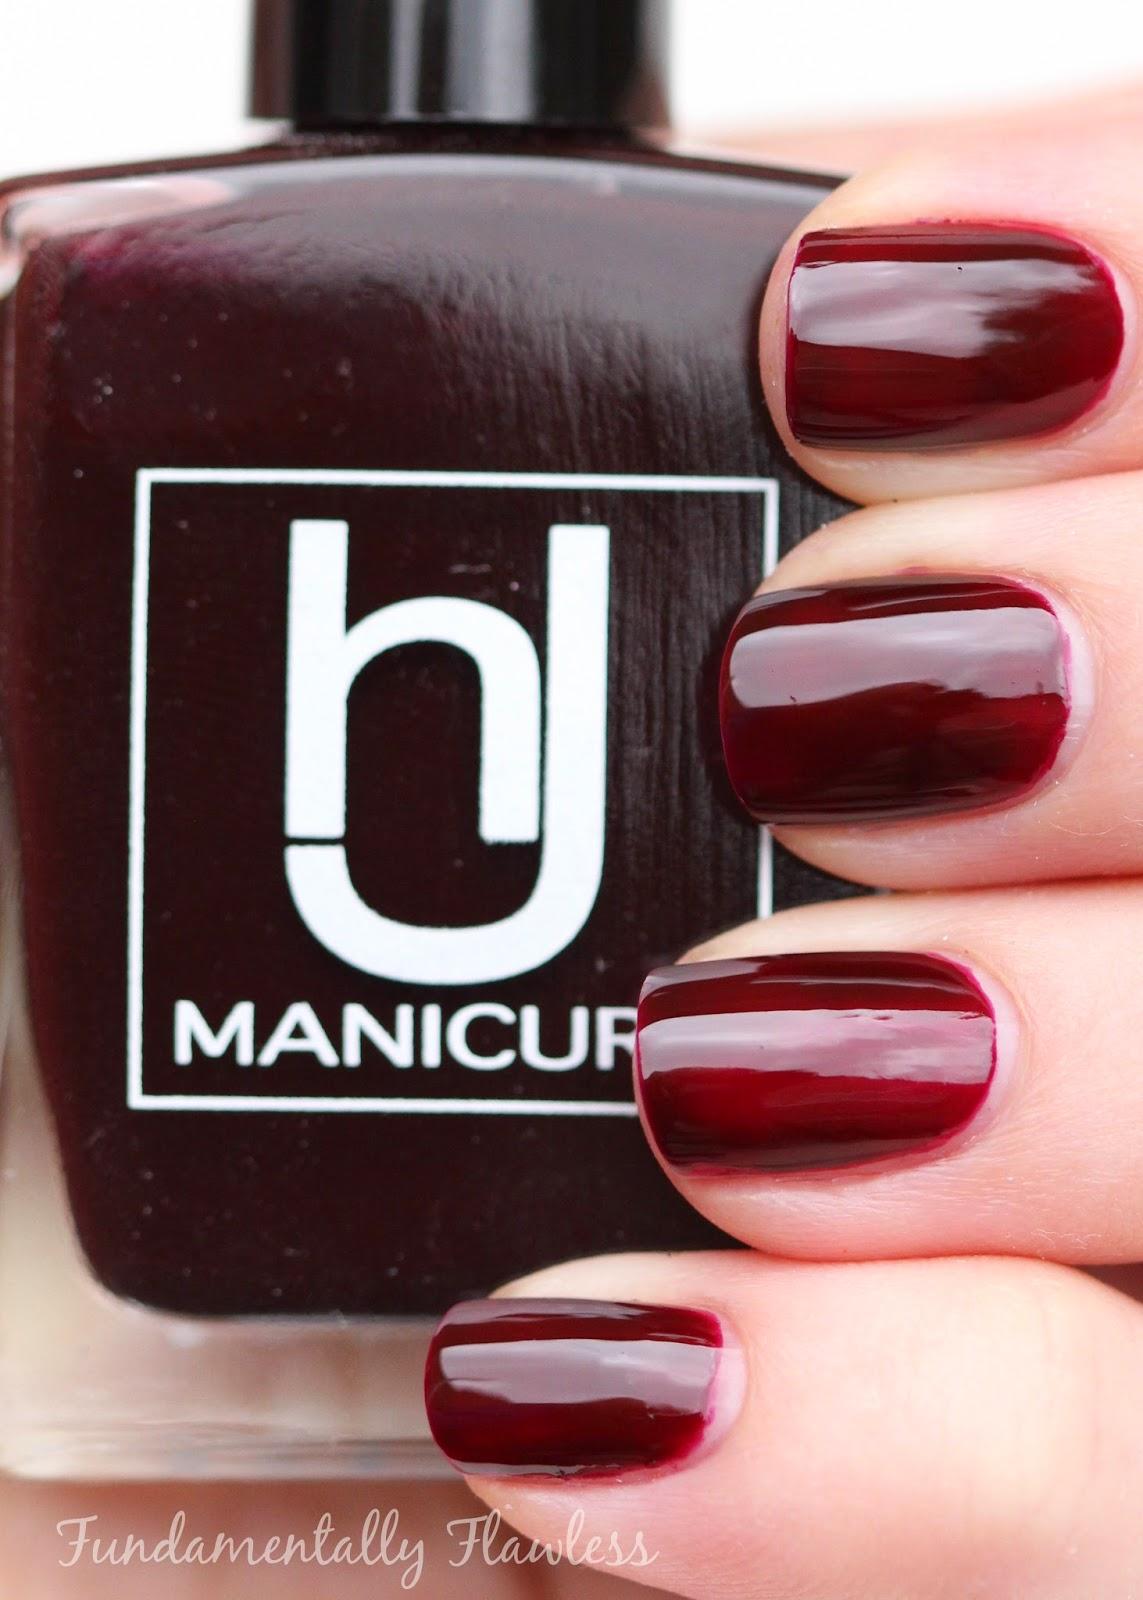 HJ Manicure Vamp swatch